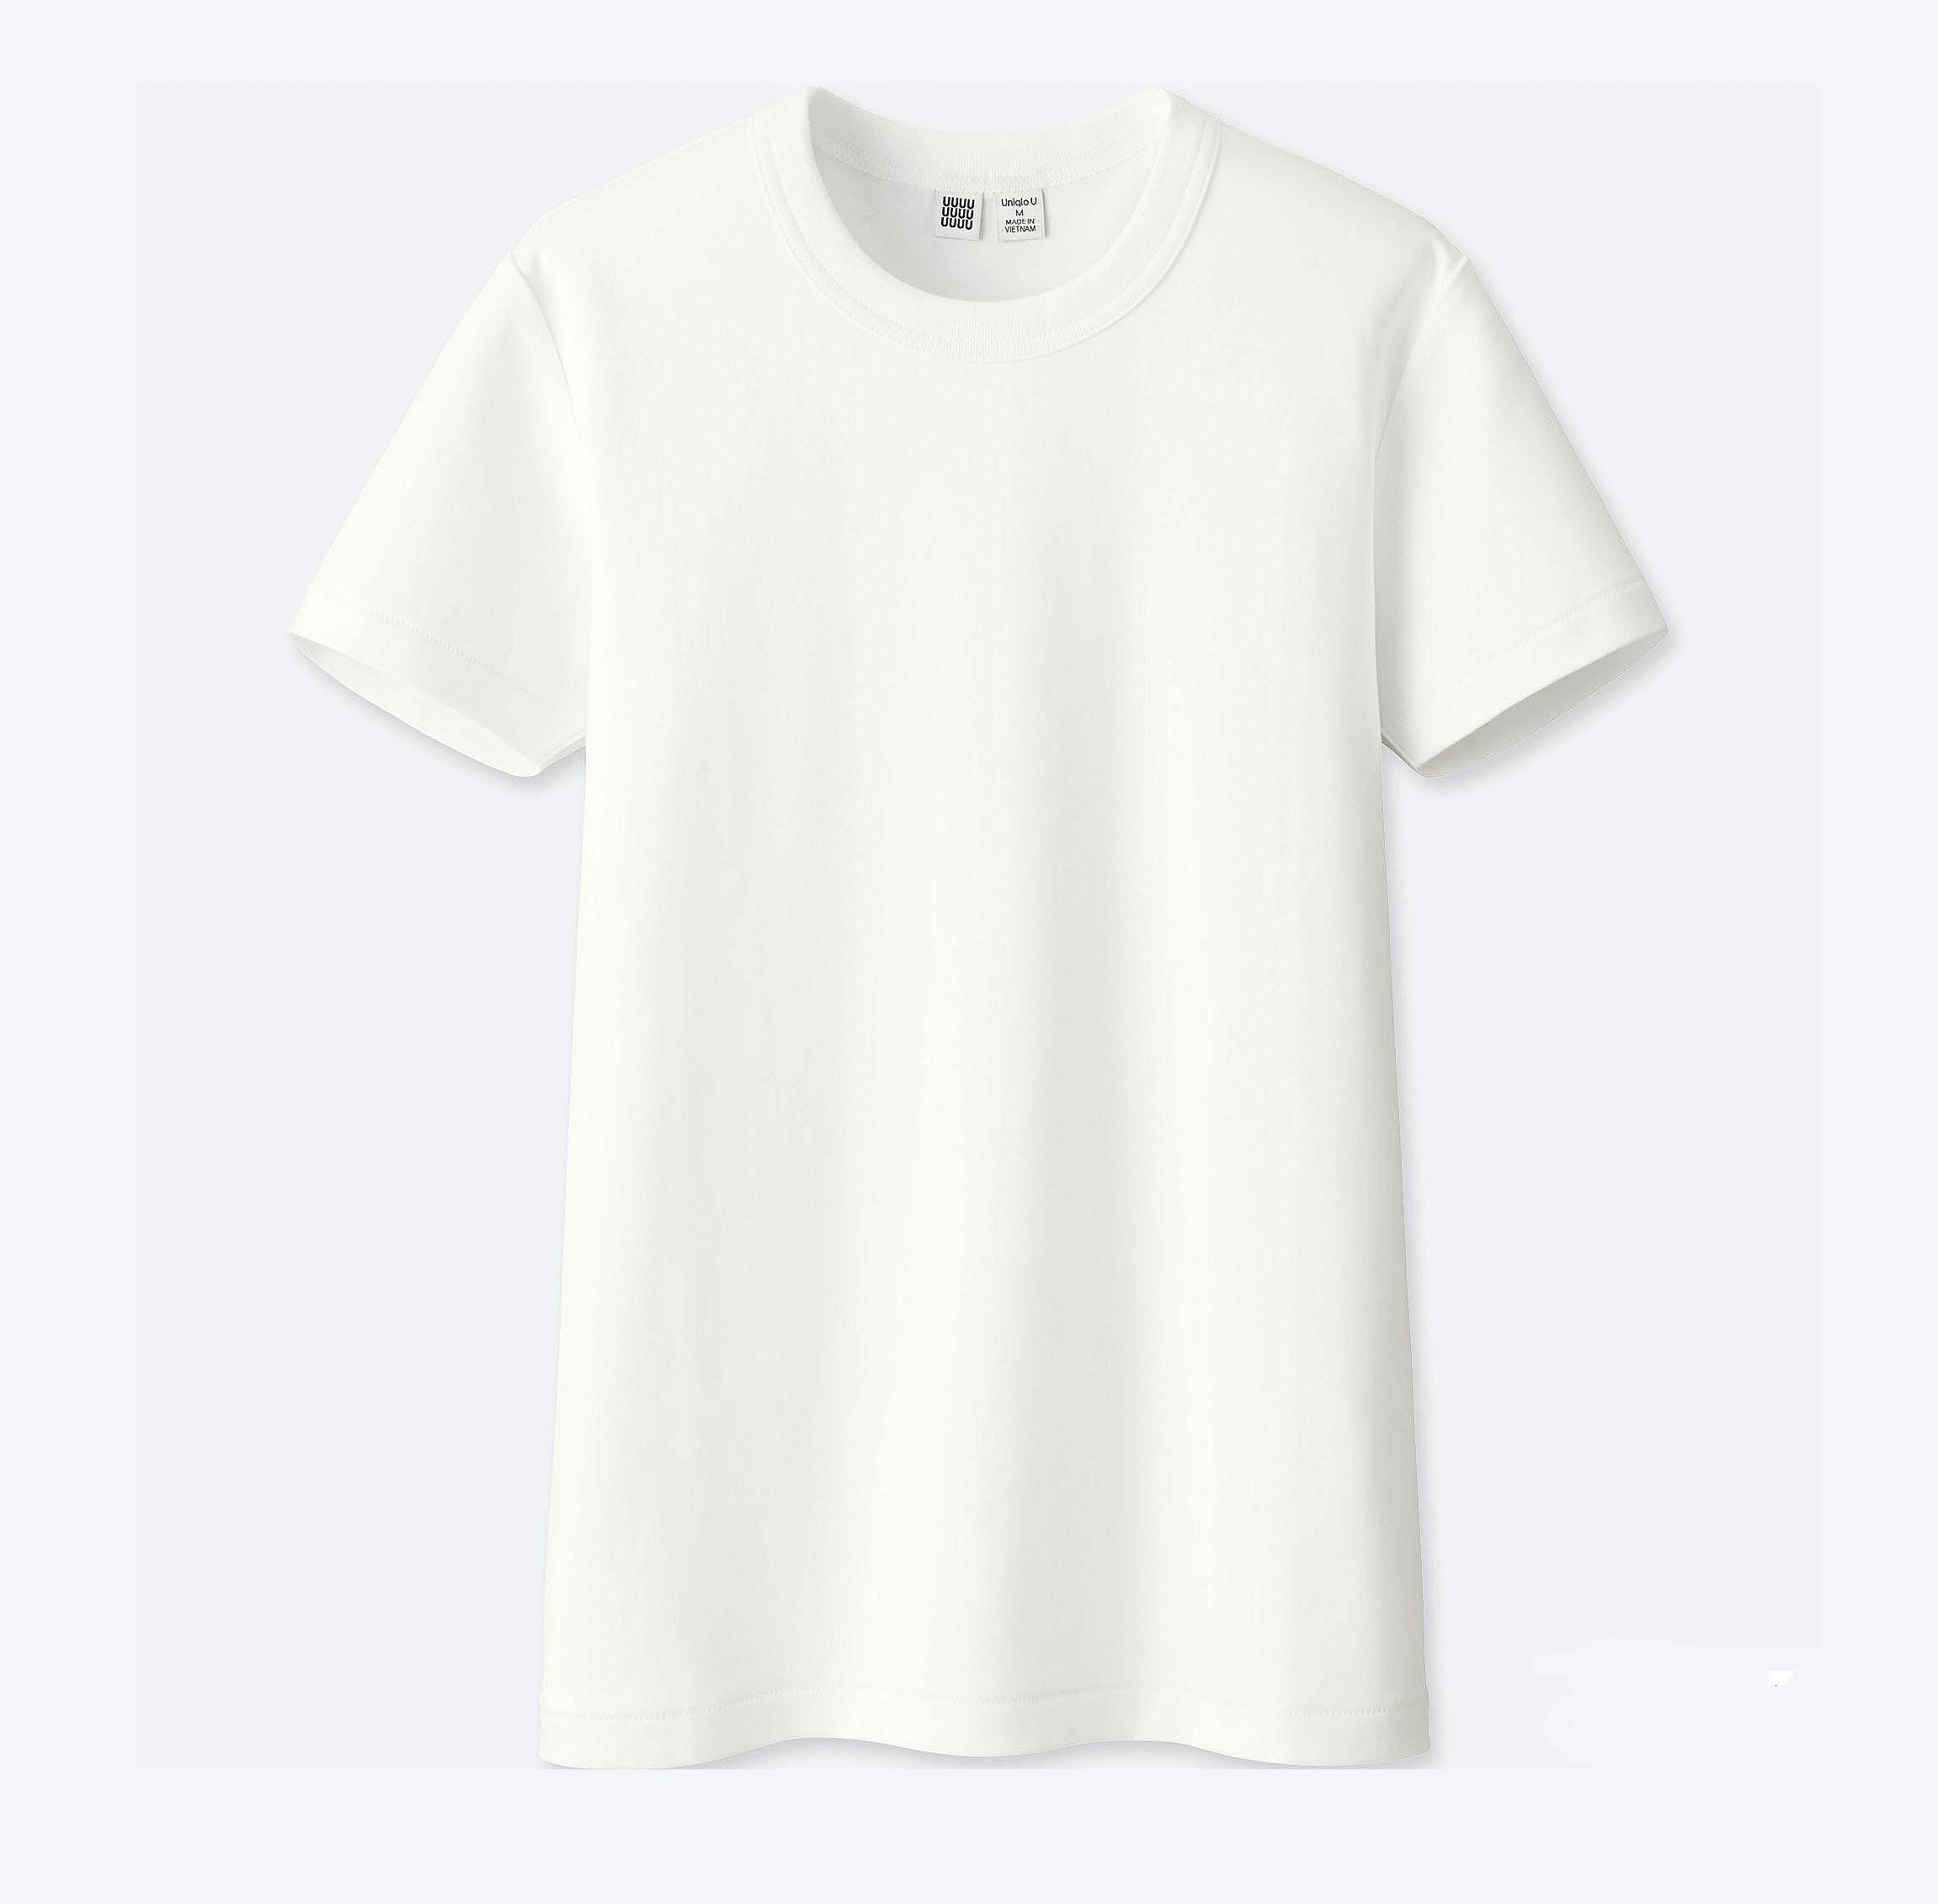 holiday capsule wardrobe: white t-shirt